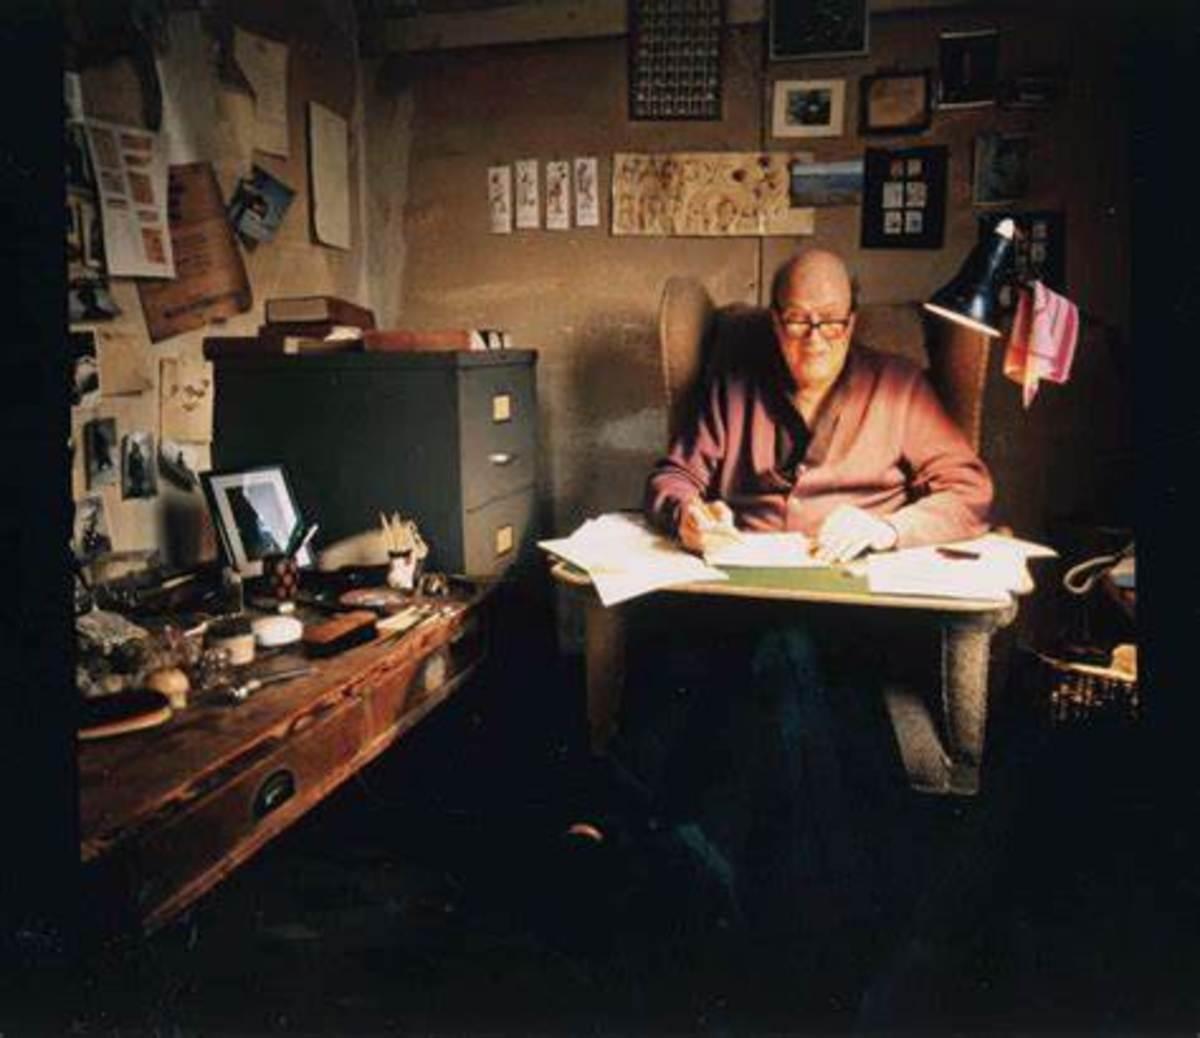 Roald Dahl busy writing